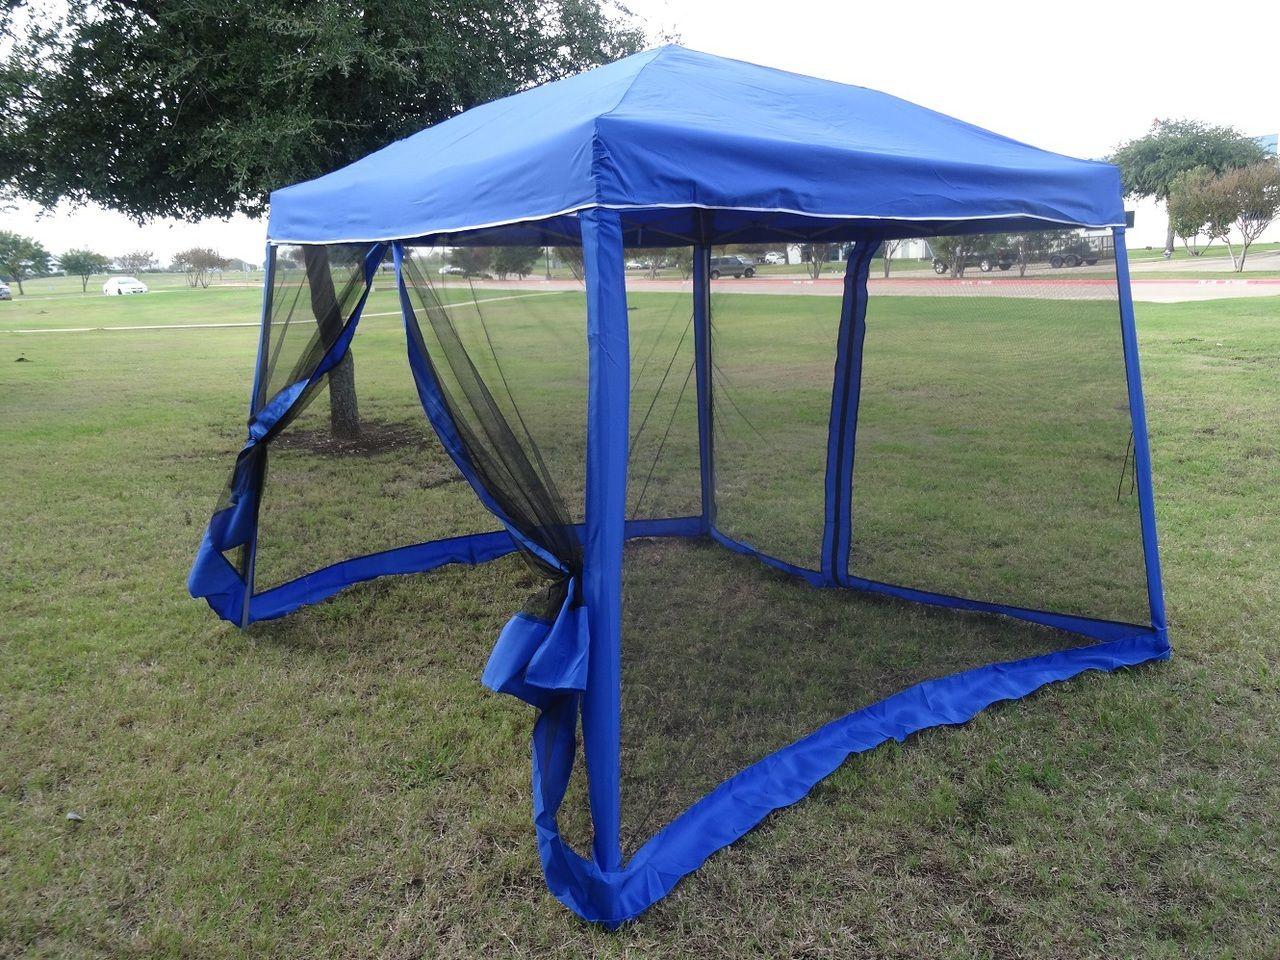 Deltacanopy 8 X8 10 X10 Blue Slant Leg Pop Up Tent With Mosquito Net 89 99 Http Deltacanopy Com 8x8 10x10 Blue Slant Leg Pop Pop Up Tent Gazebo Tent